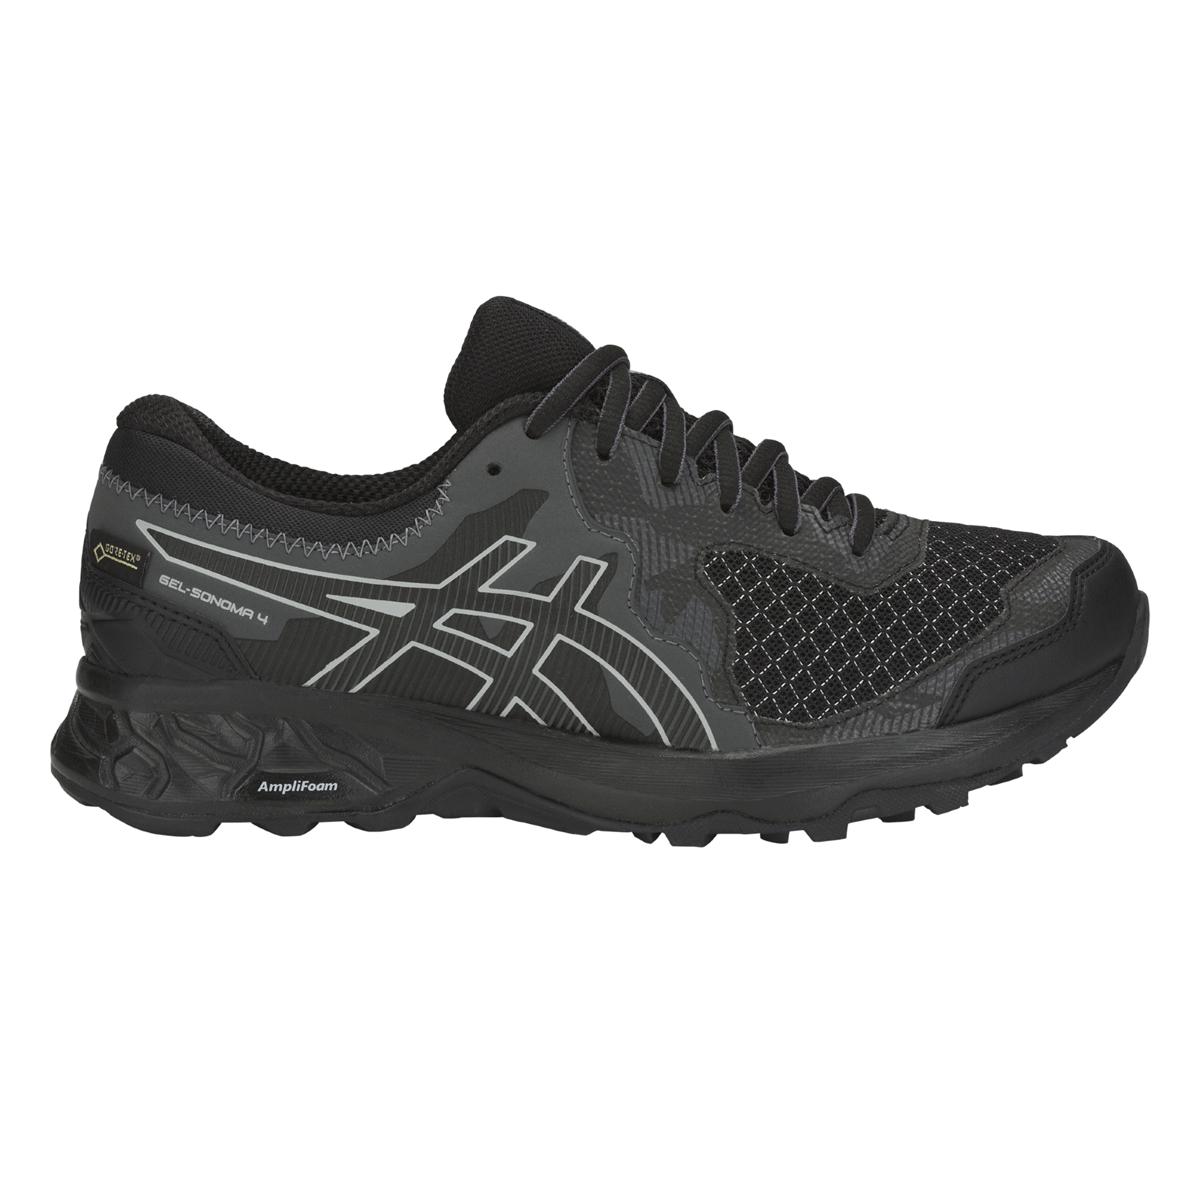 Asics gel Sonoma 4 G-TX-señora zapatillas-Running-negro-gris - 1012a191